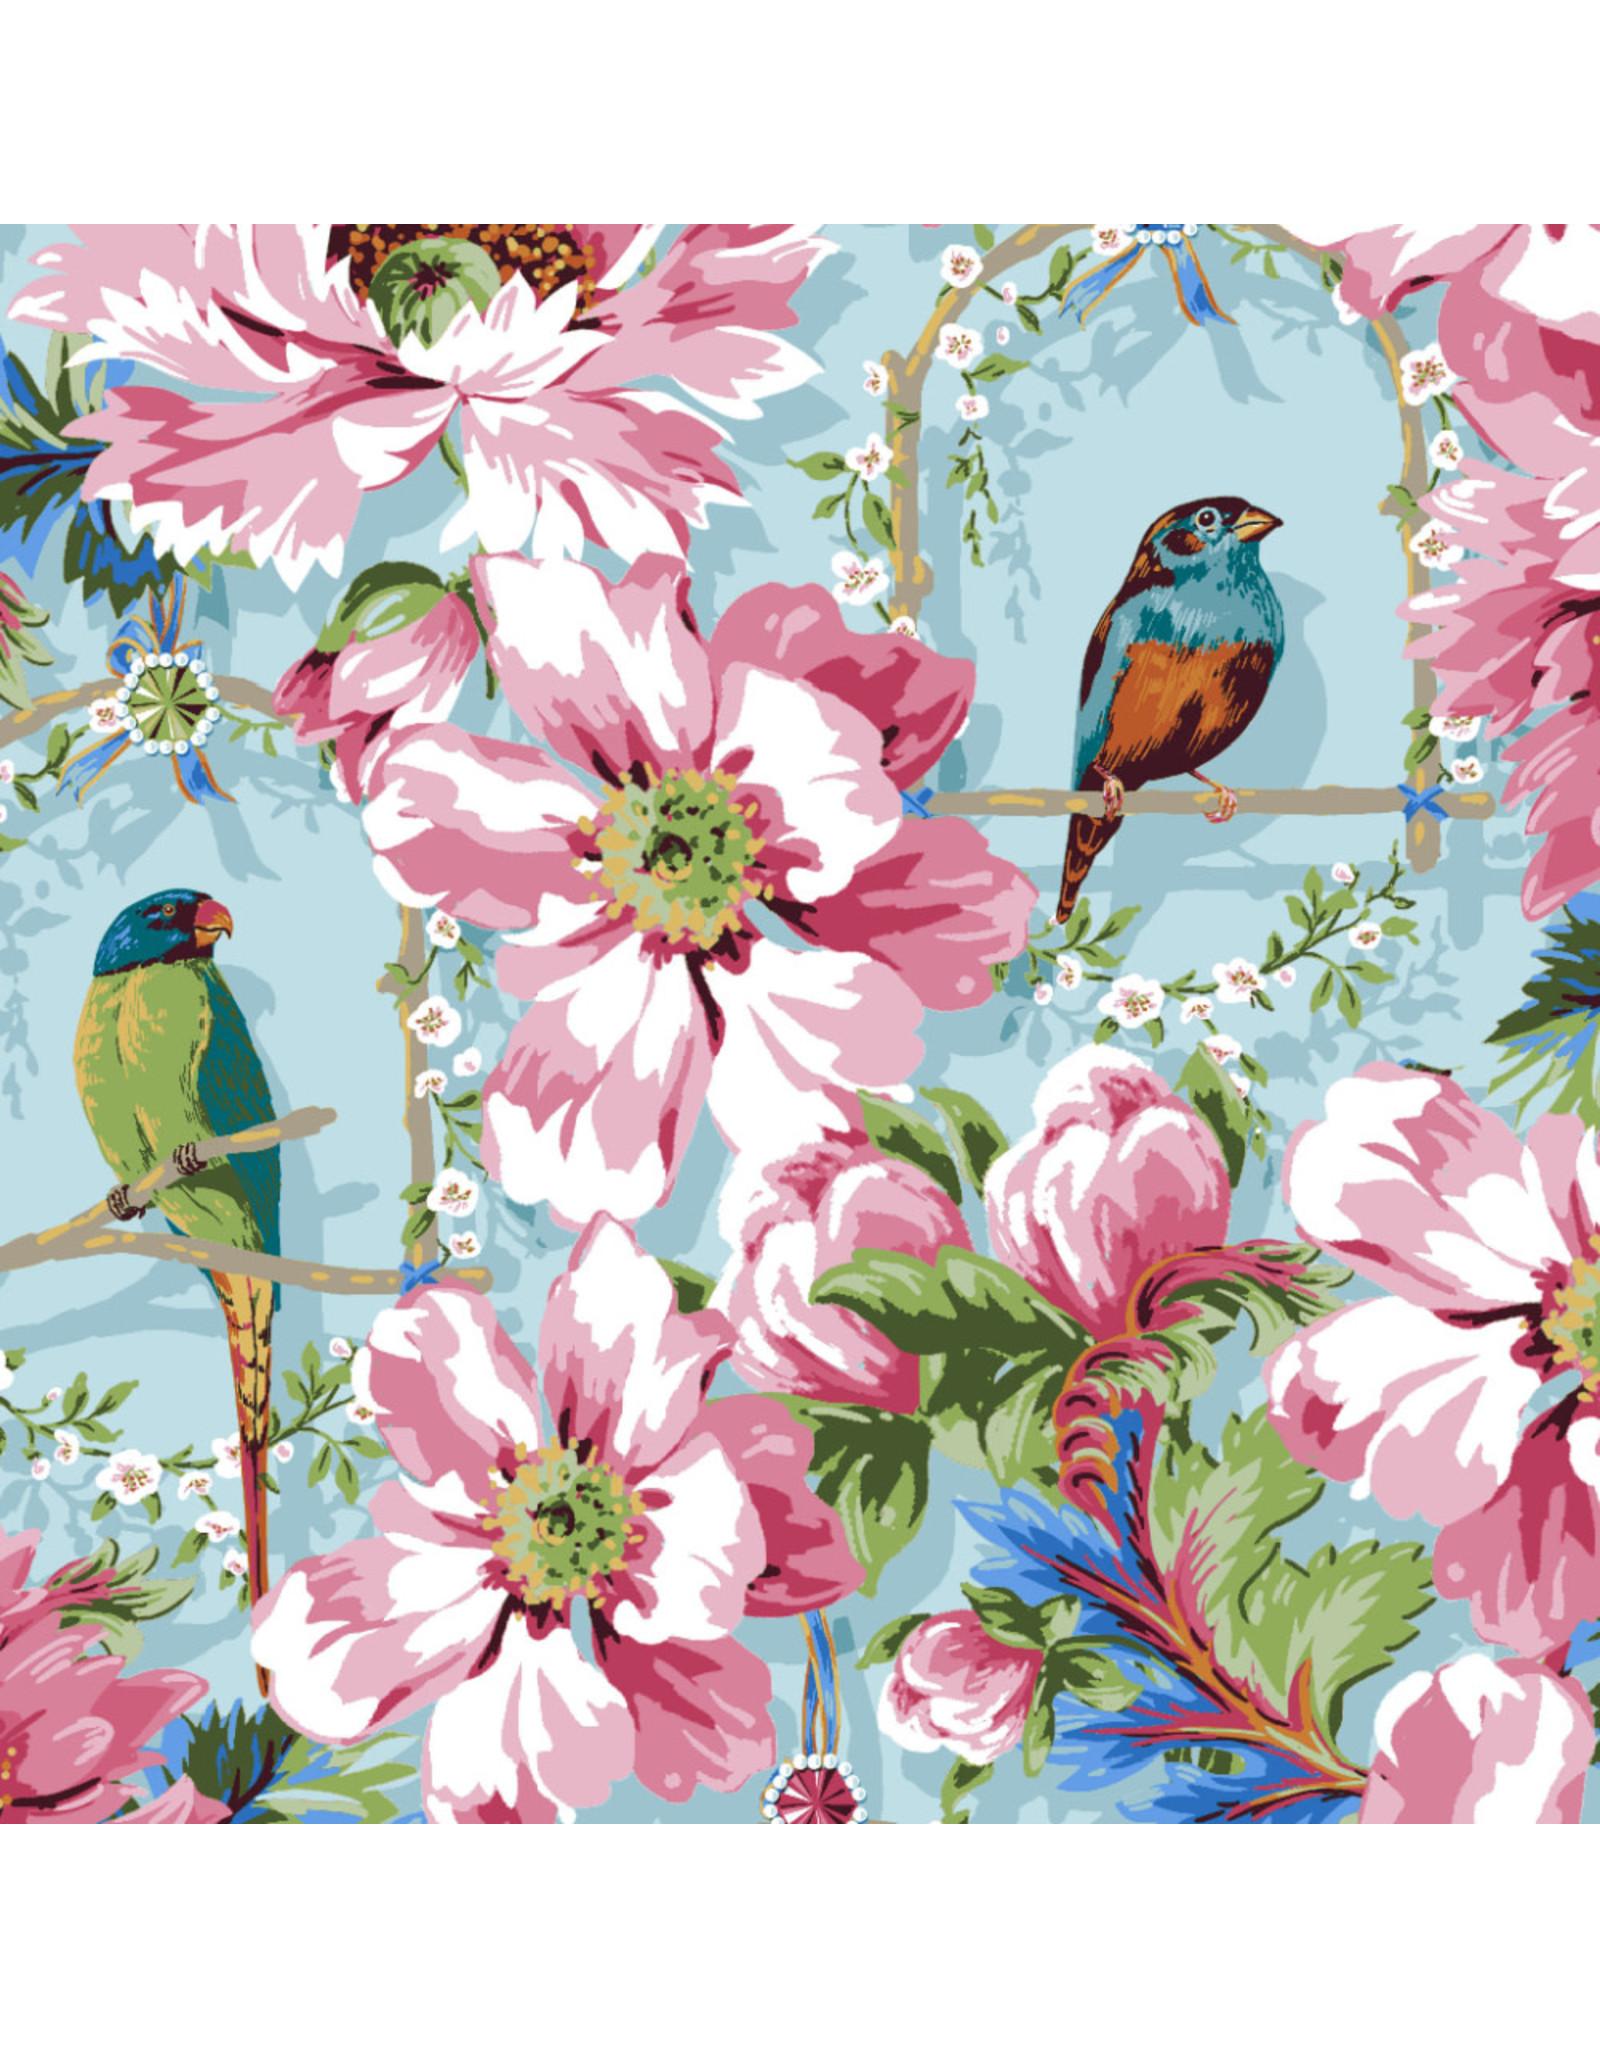 Odile Bailloeul Jardin de la Reine, The Queen's Musicians in Sky, Fabric Half-Yards